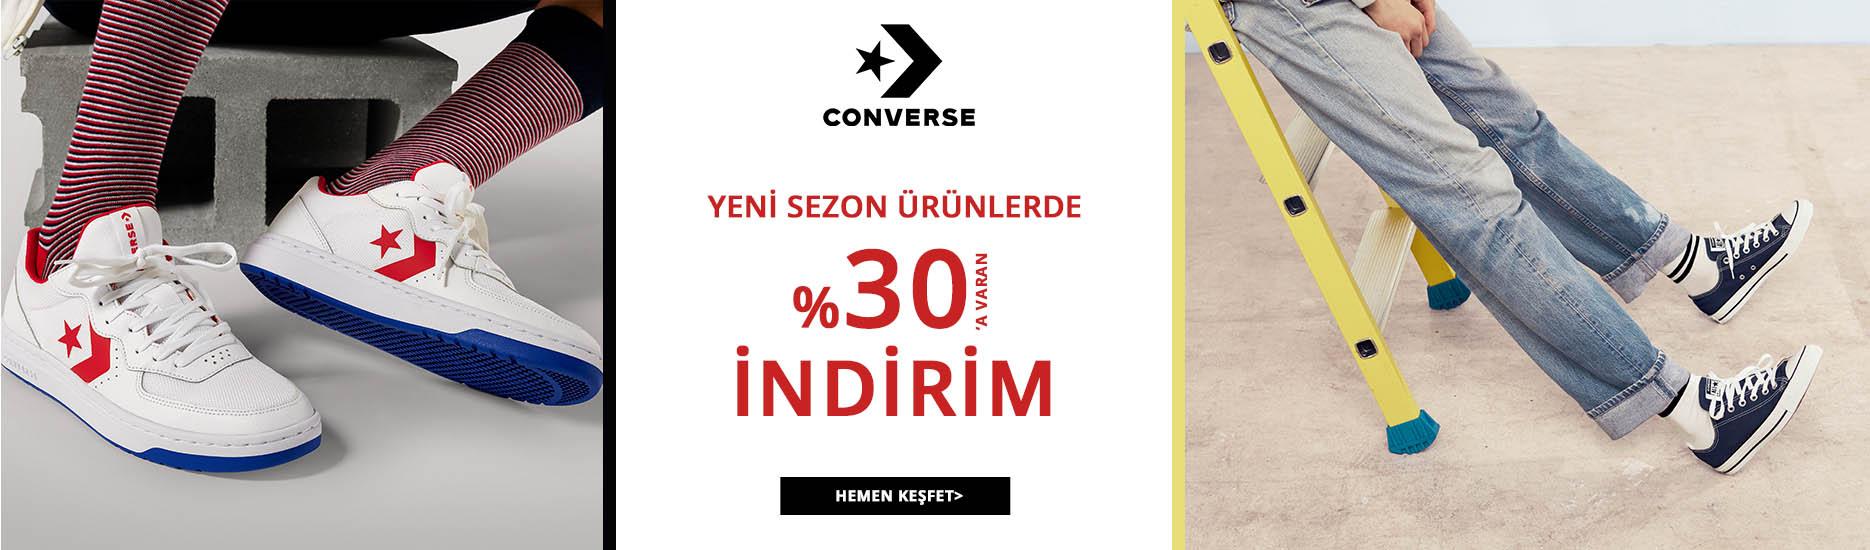 converse-indirim